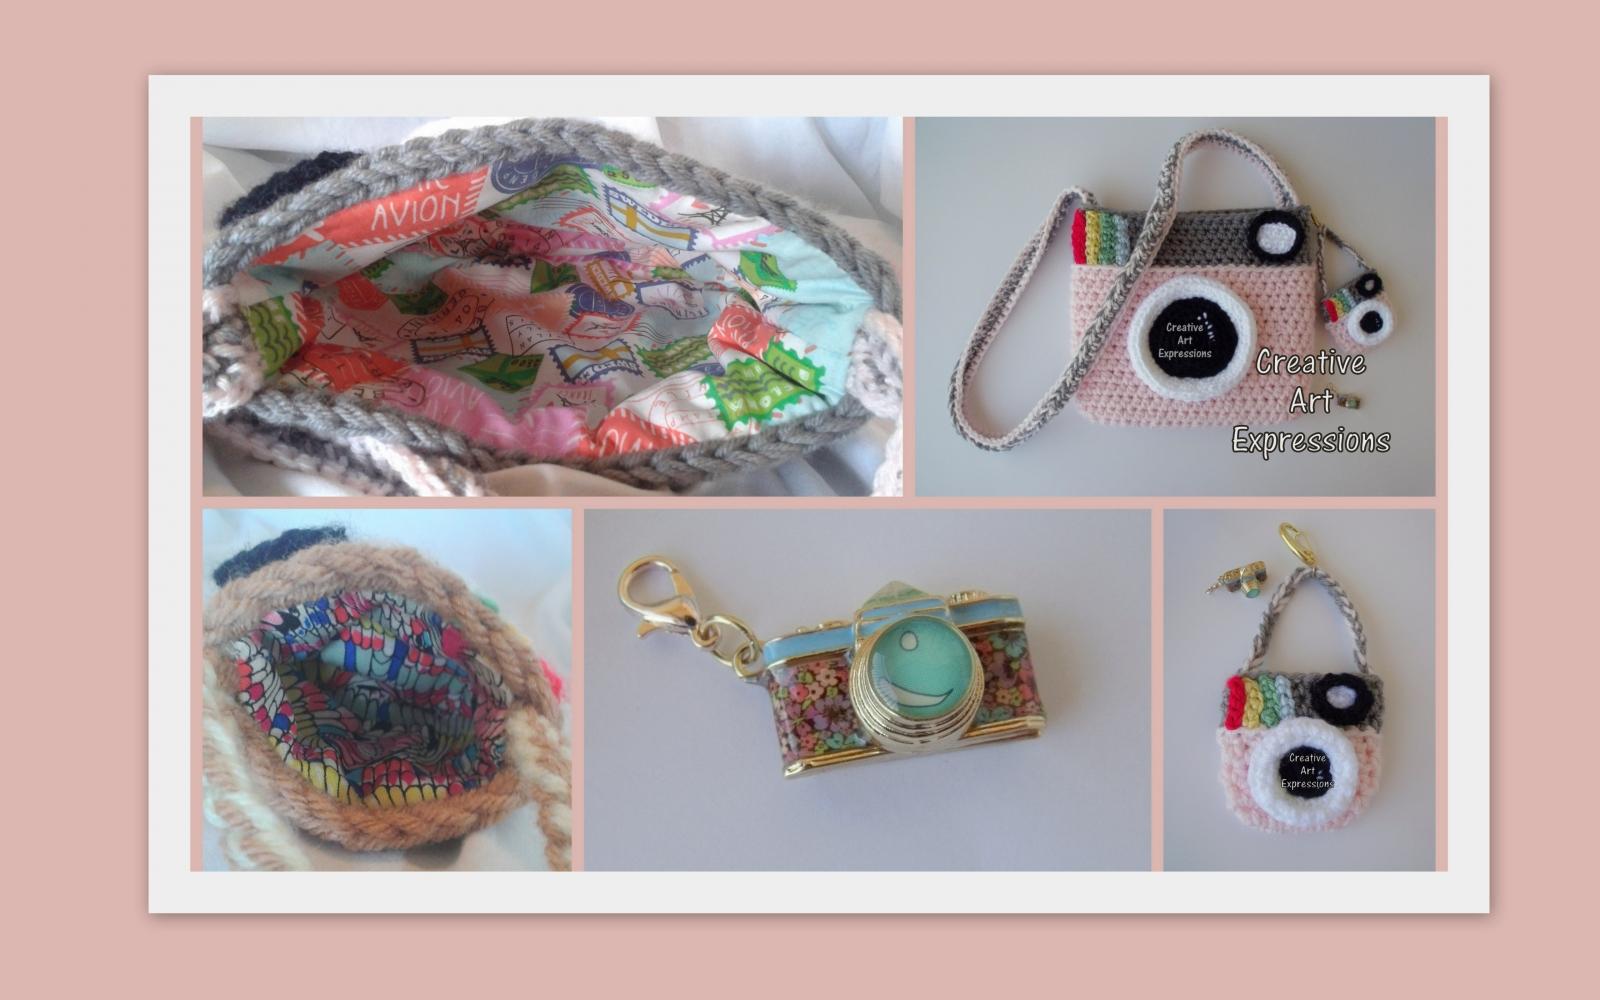 Pink & Gray Vintage Camera Purse Crocheted